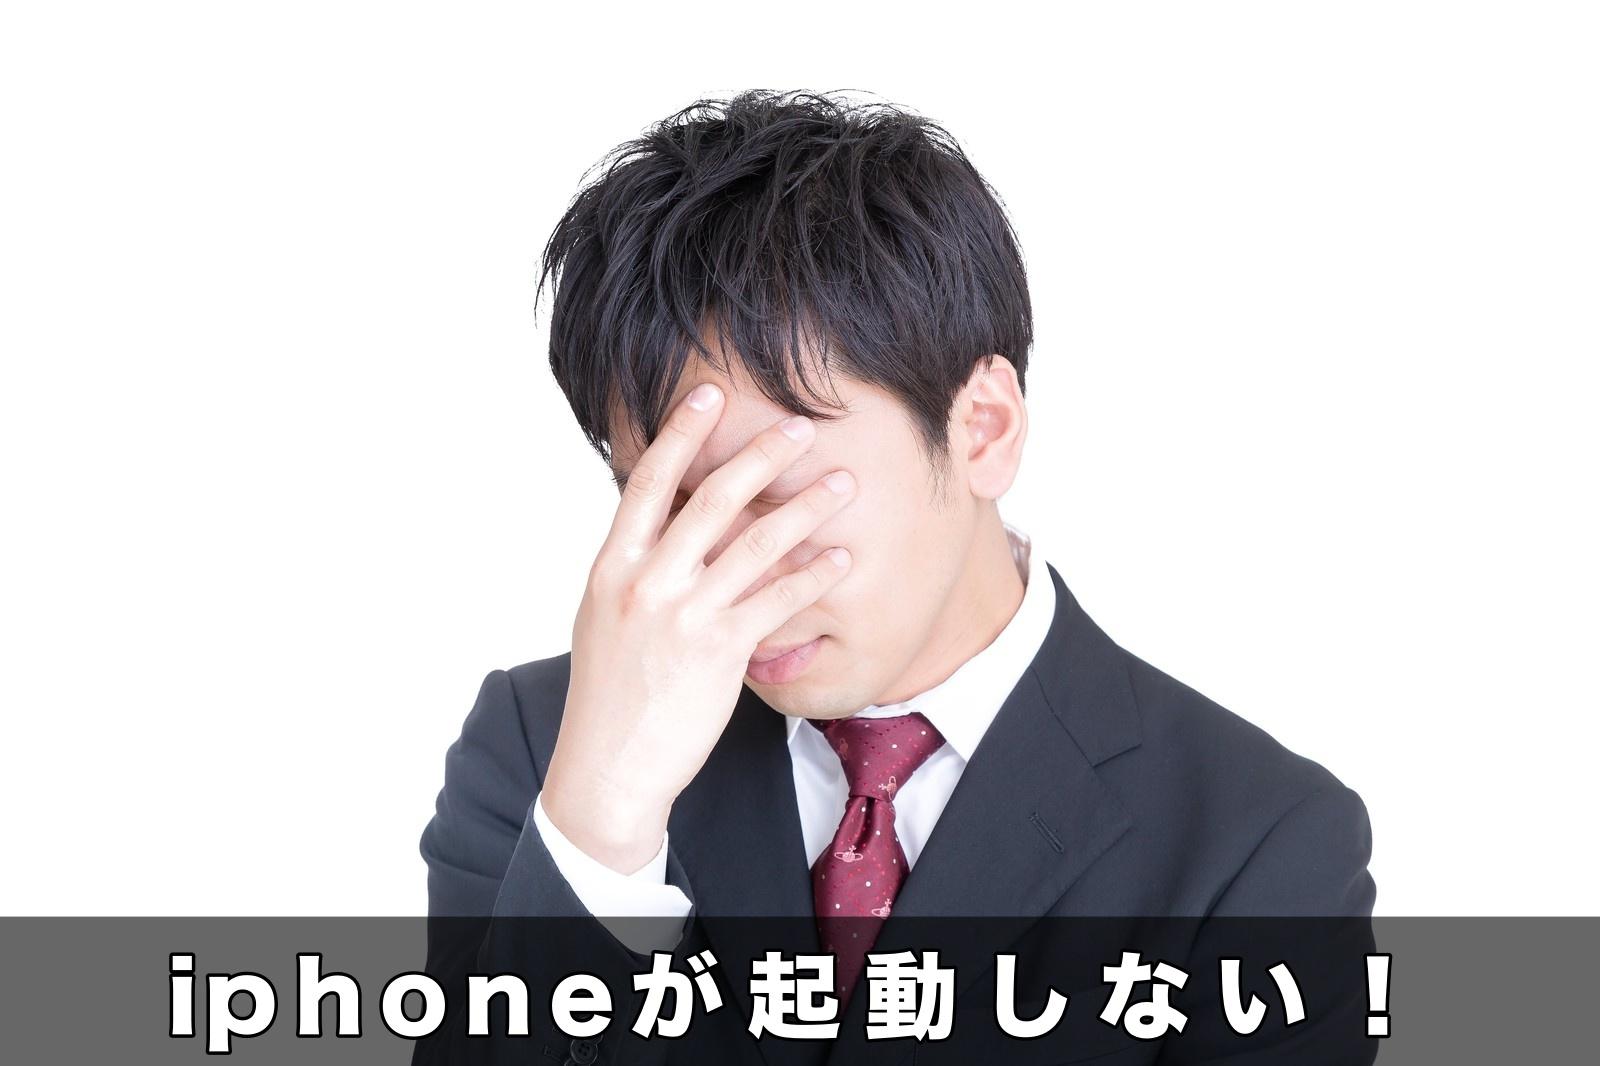 iphoneが起動しない・電源がつかない時の対処法!